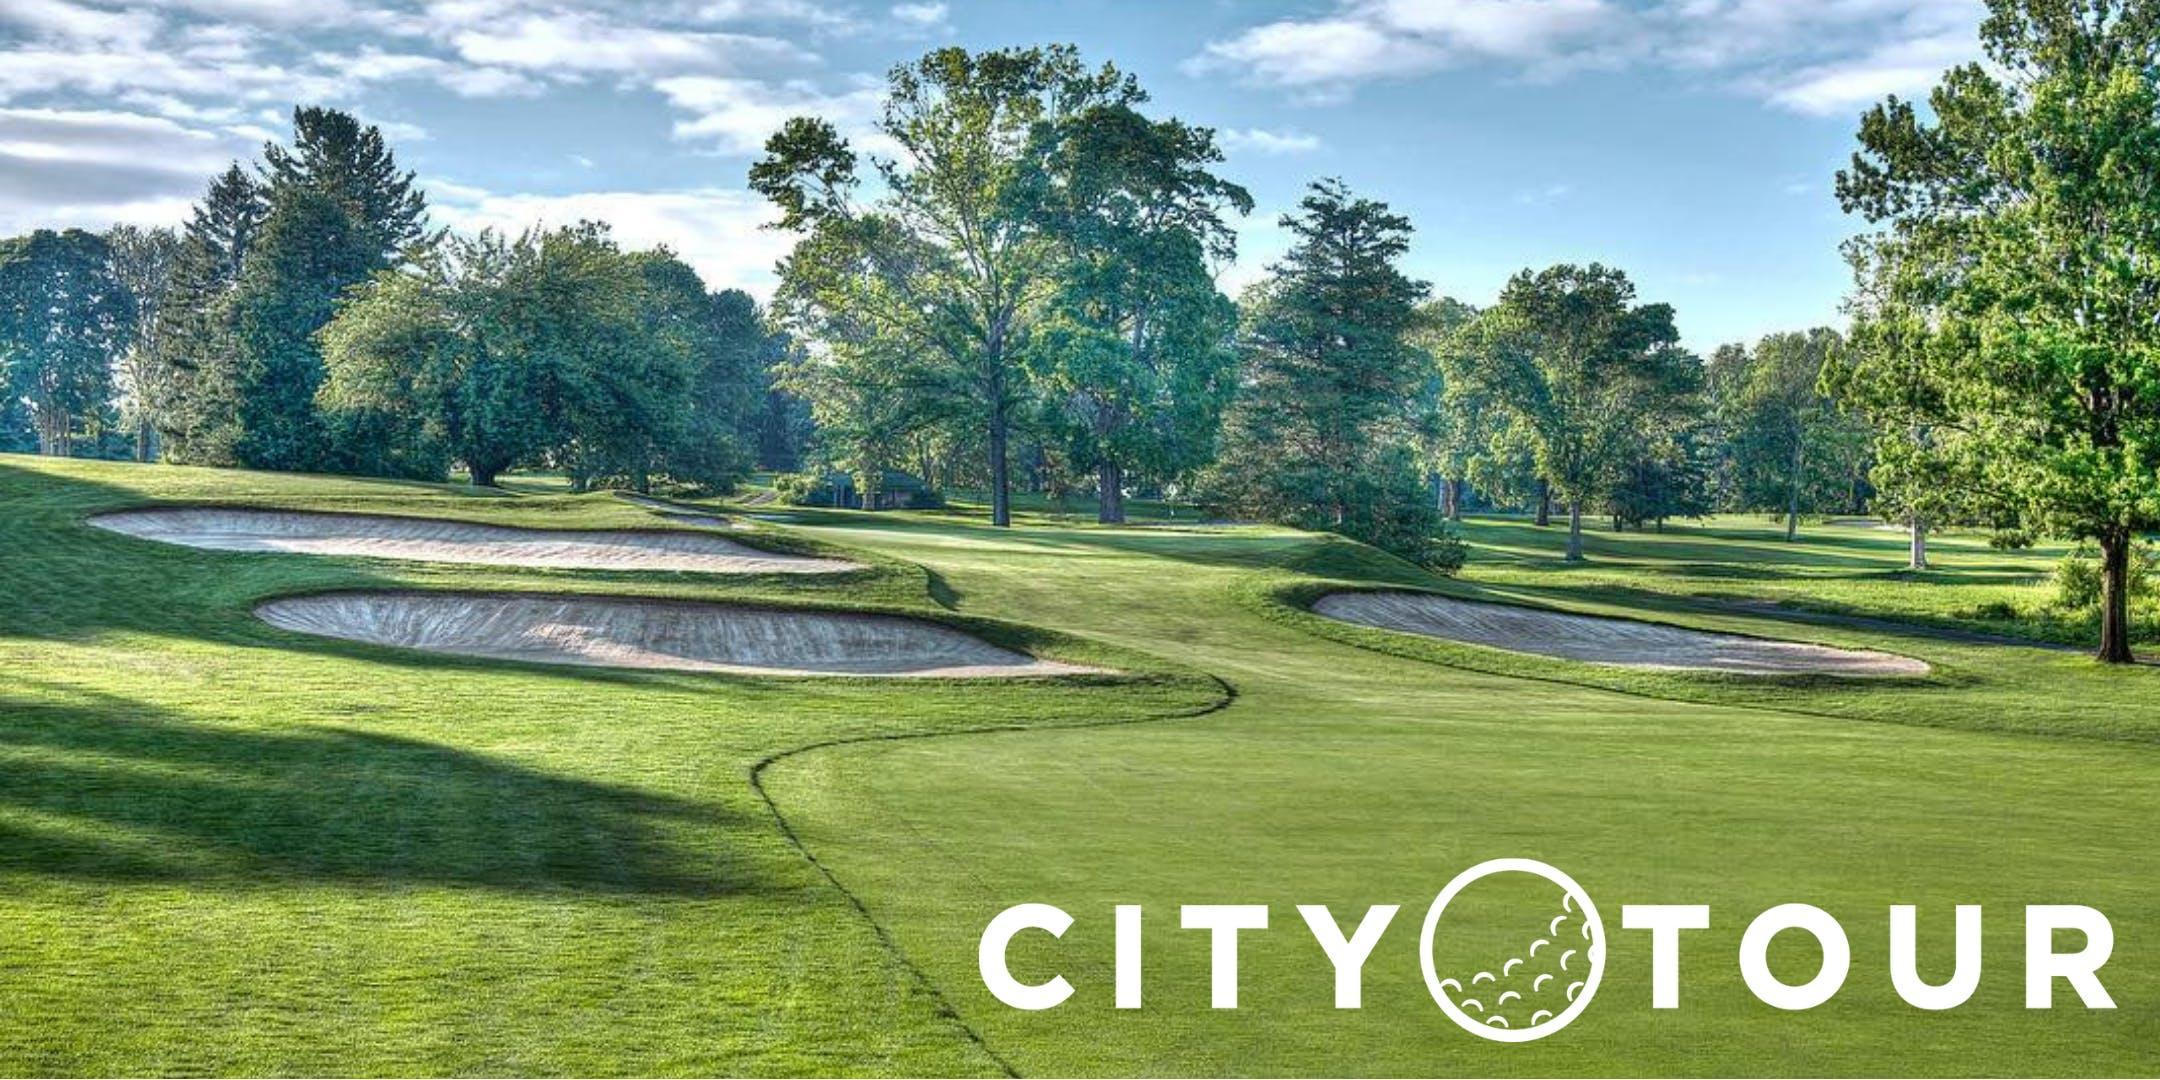 Cincinnati City Tour - TPC River's Bend